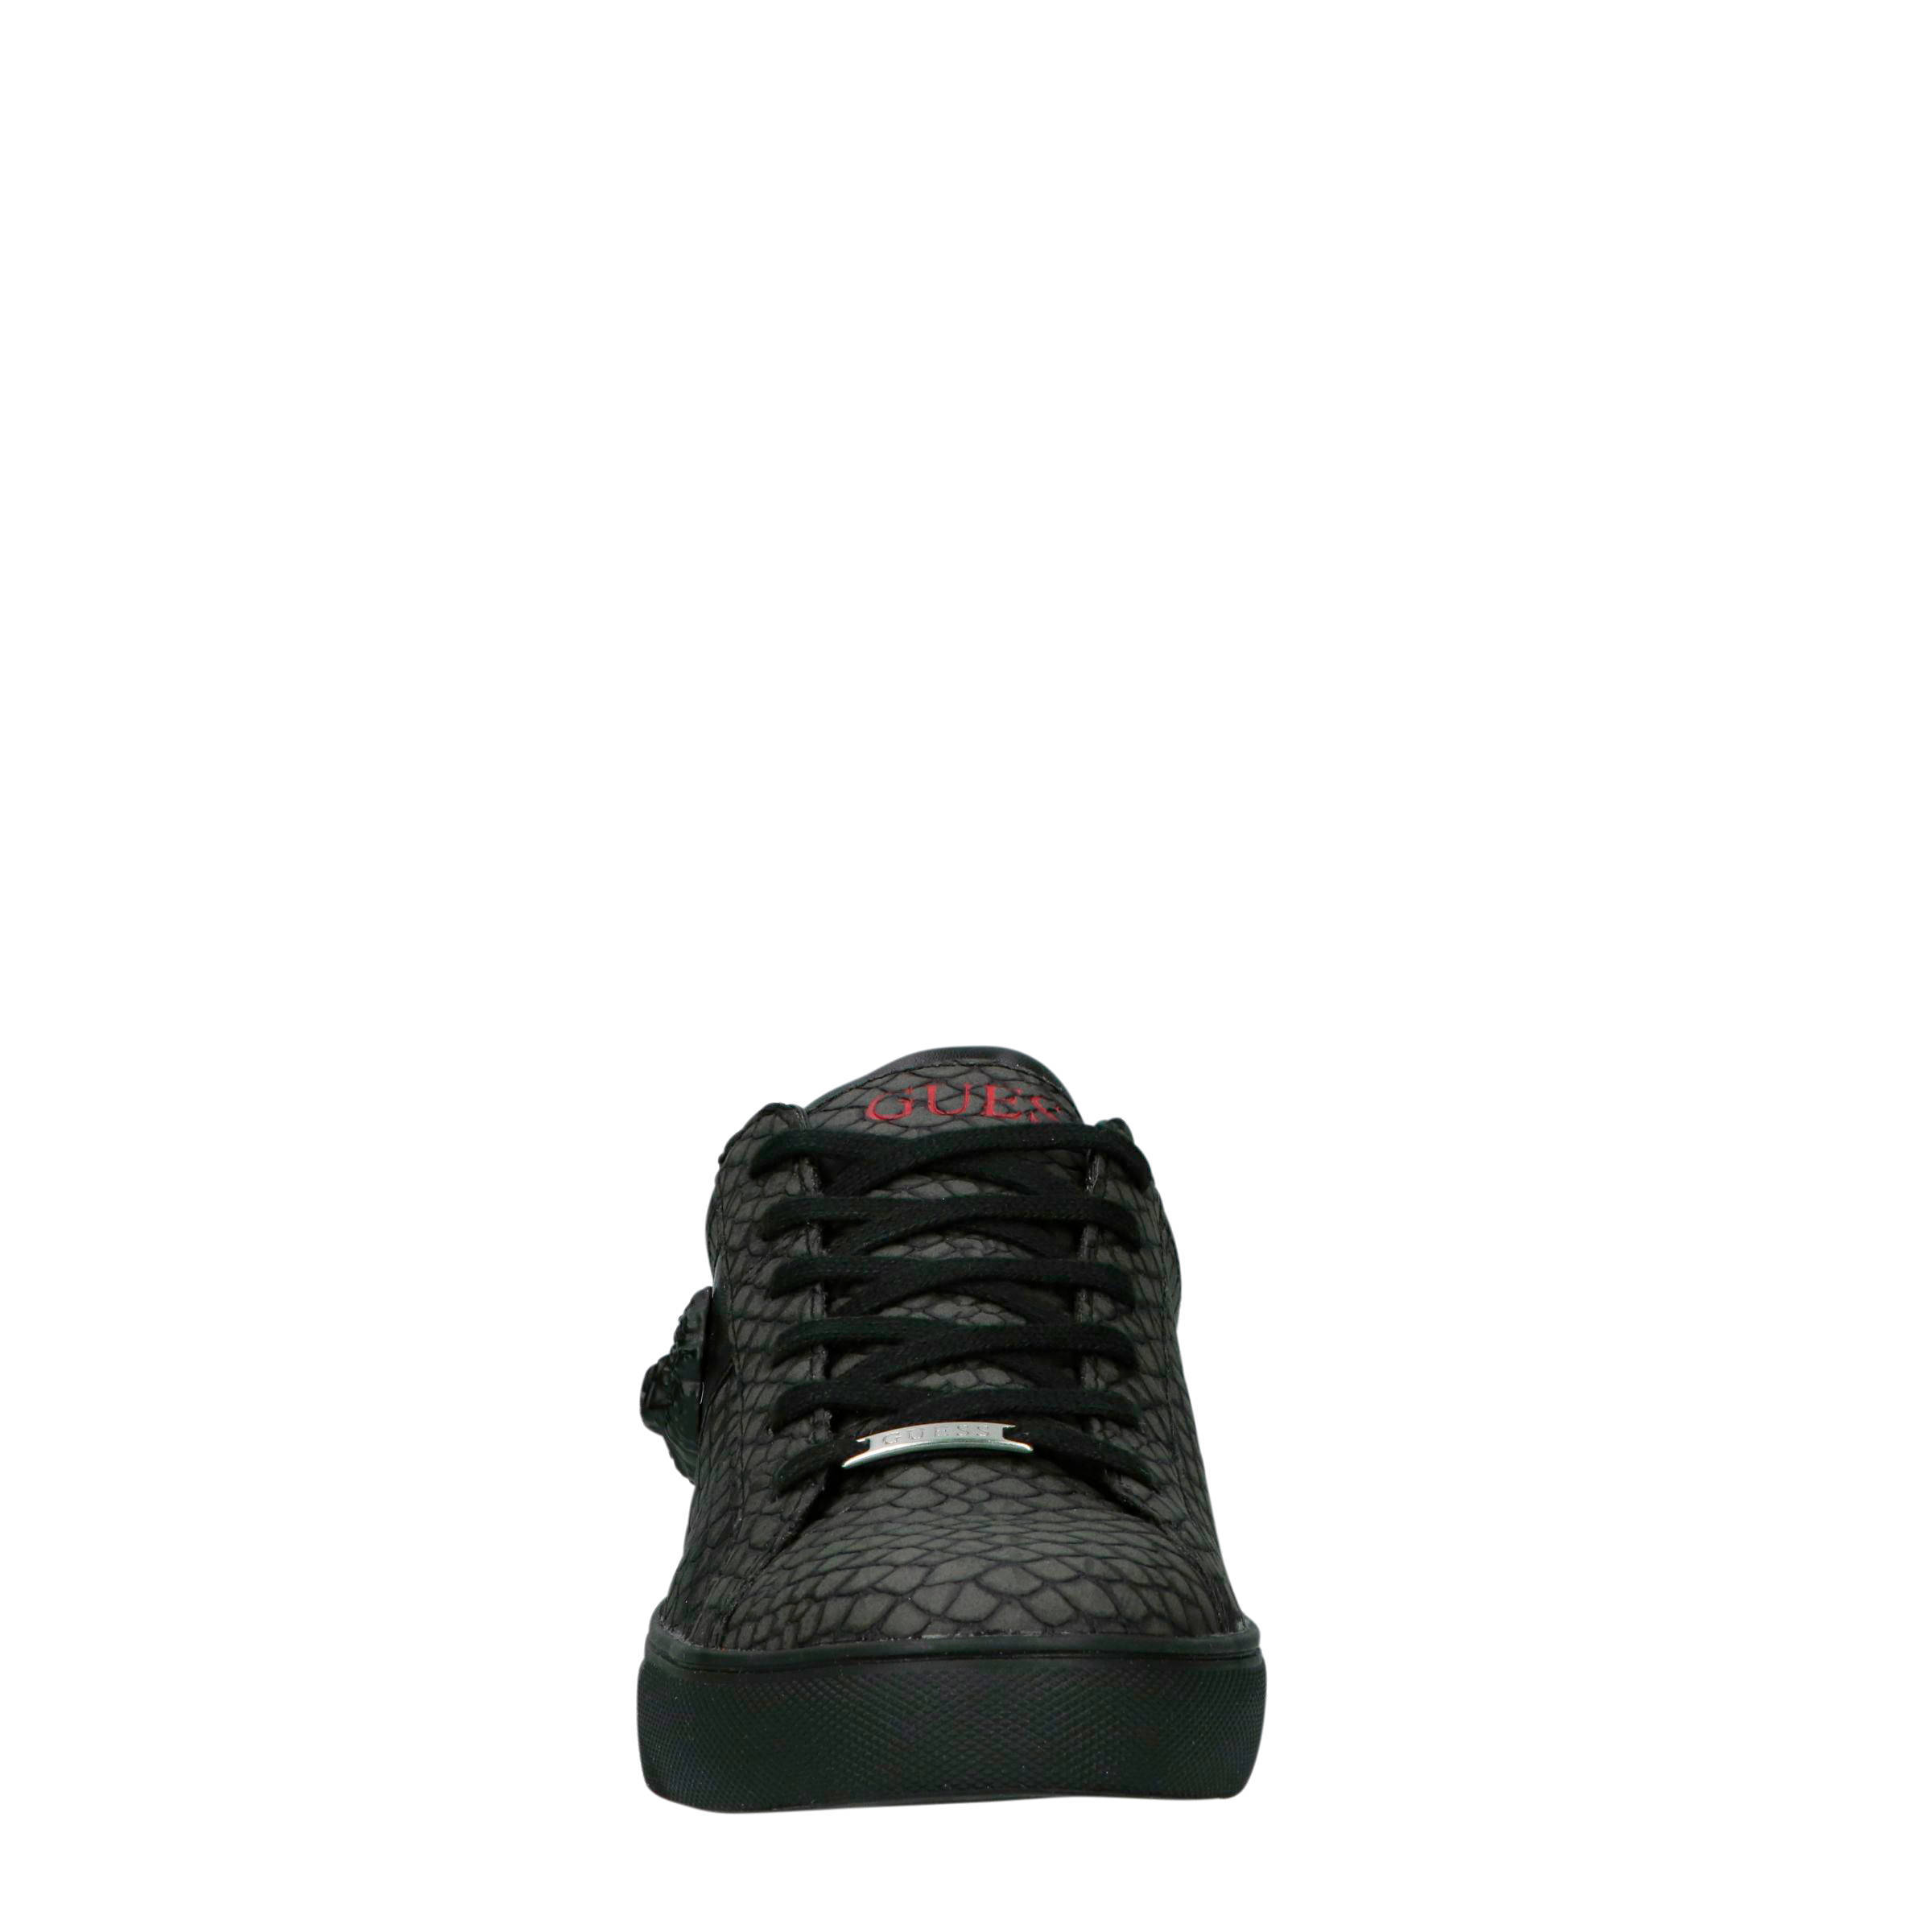 GUESS sneakers antraciet | wehkamp